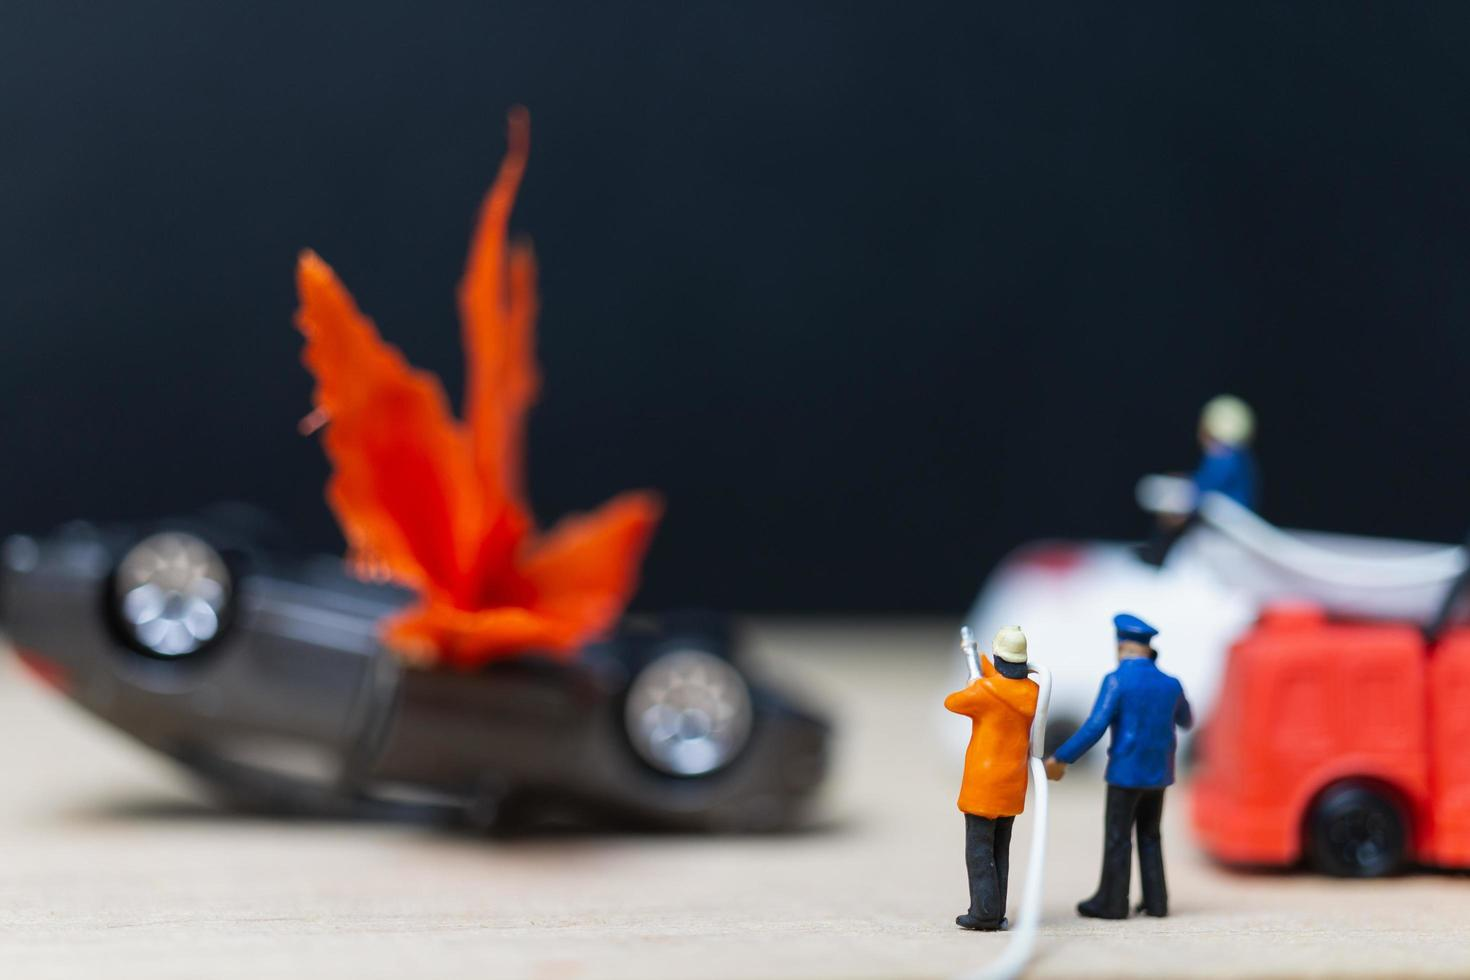 Bomberos en miniatura en un accidente de coche, concepto de accidente de coche foto